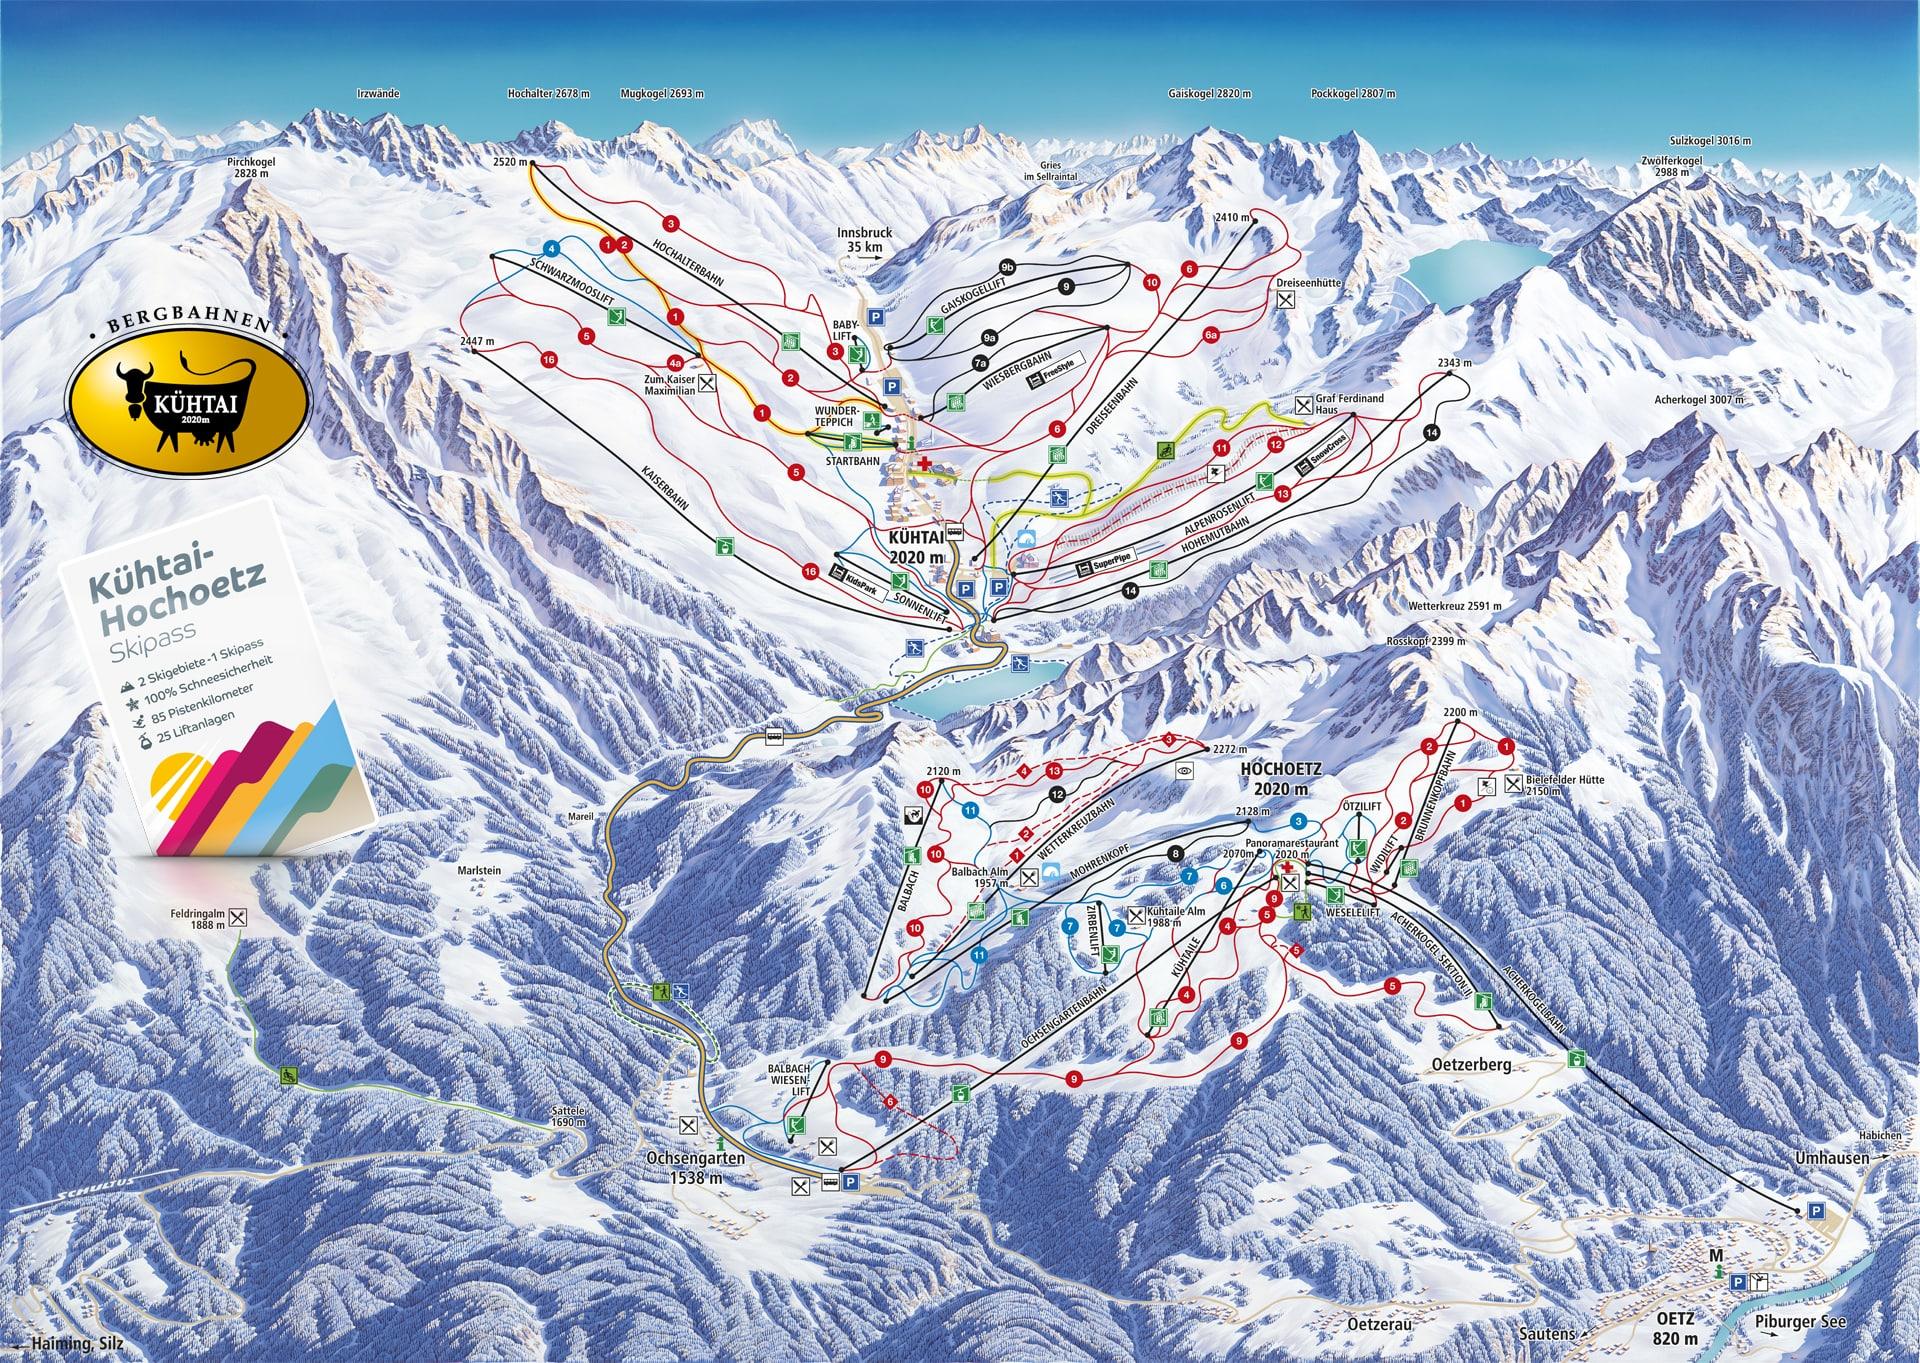 Oetz mapka narciarska